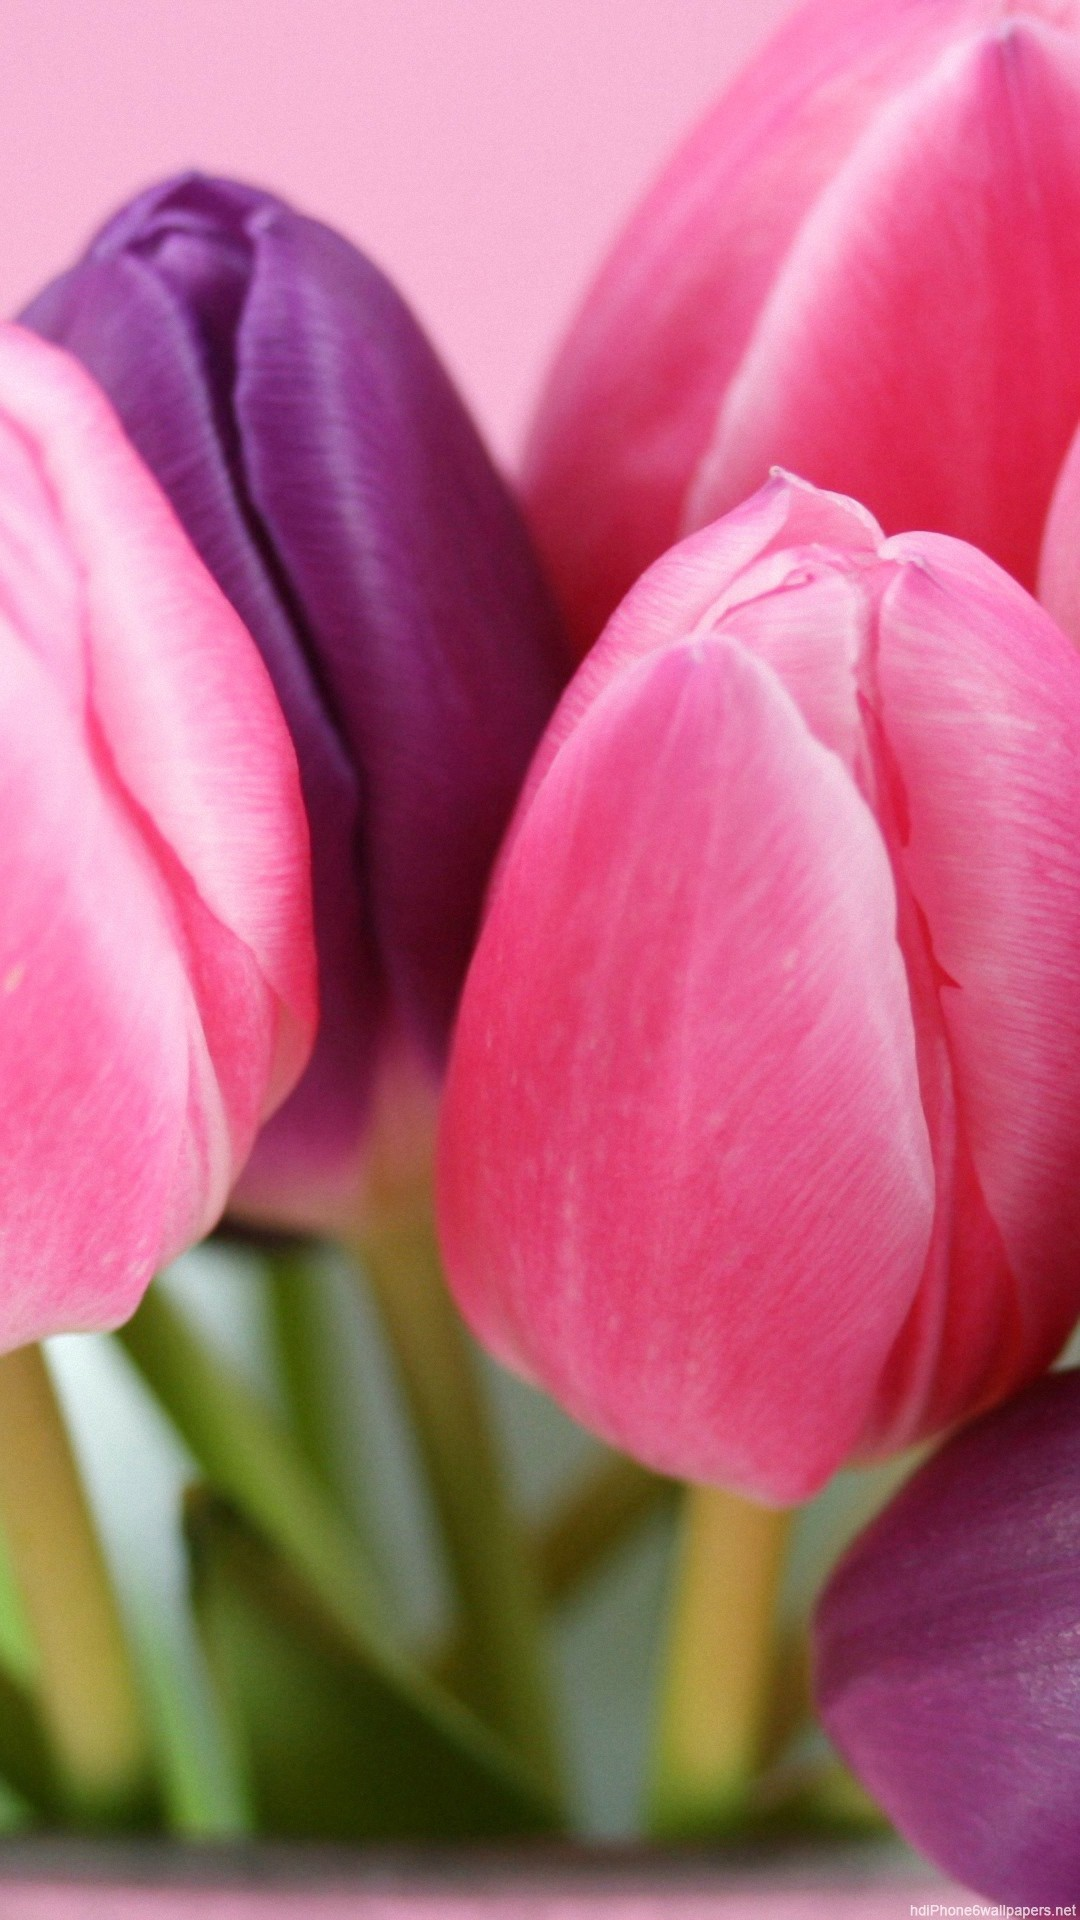 Tulip Flower Wallpaper (67+ images)